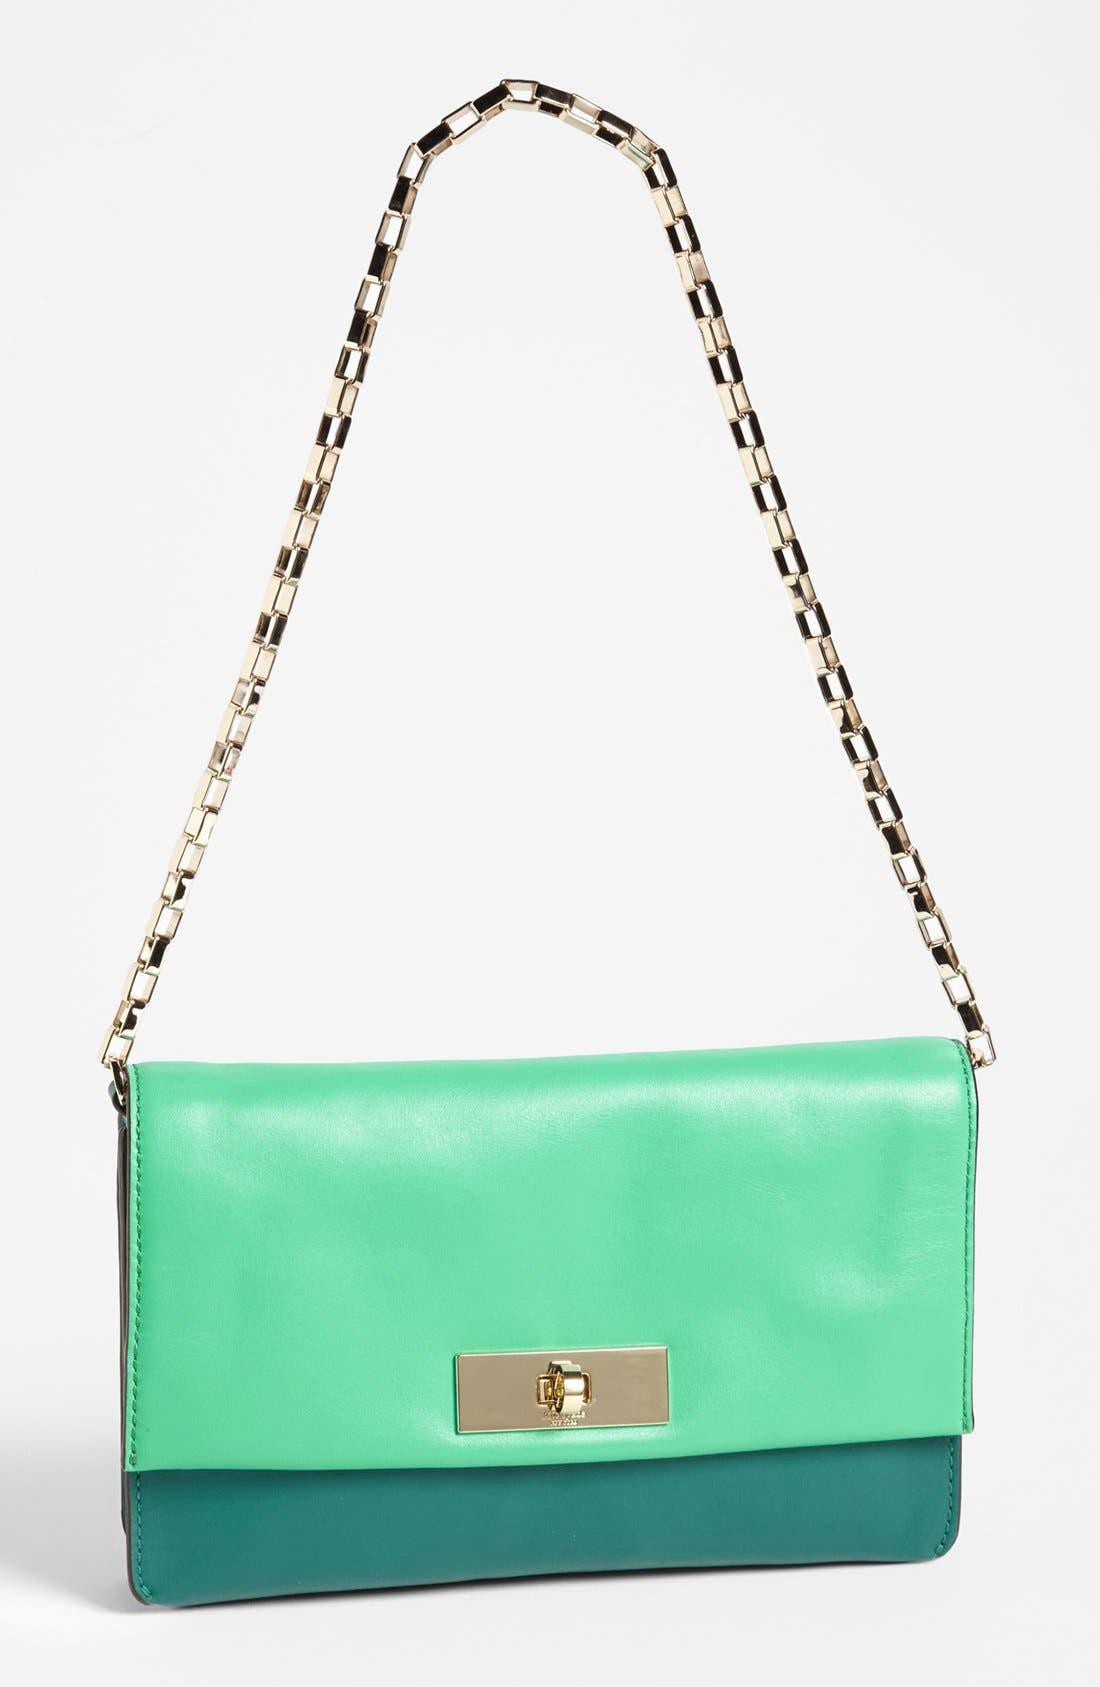 Alternate Image 1 Selected - kate spade new york 'lincoln square - garrett' shoulder bag